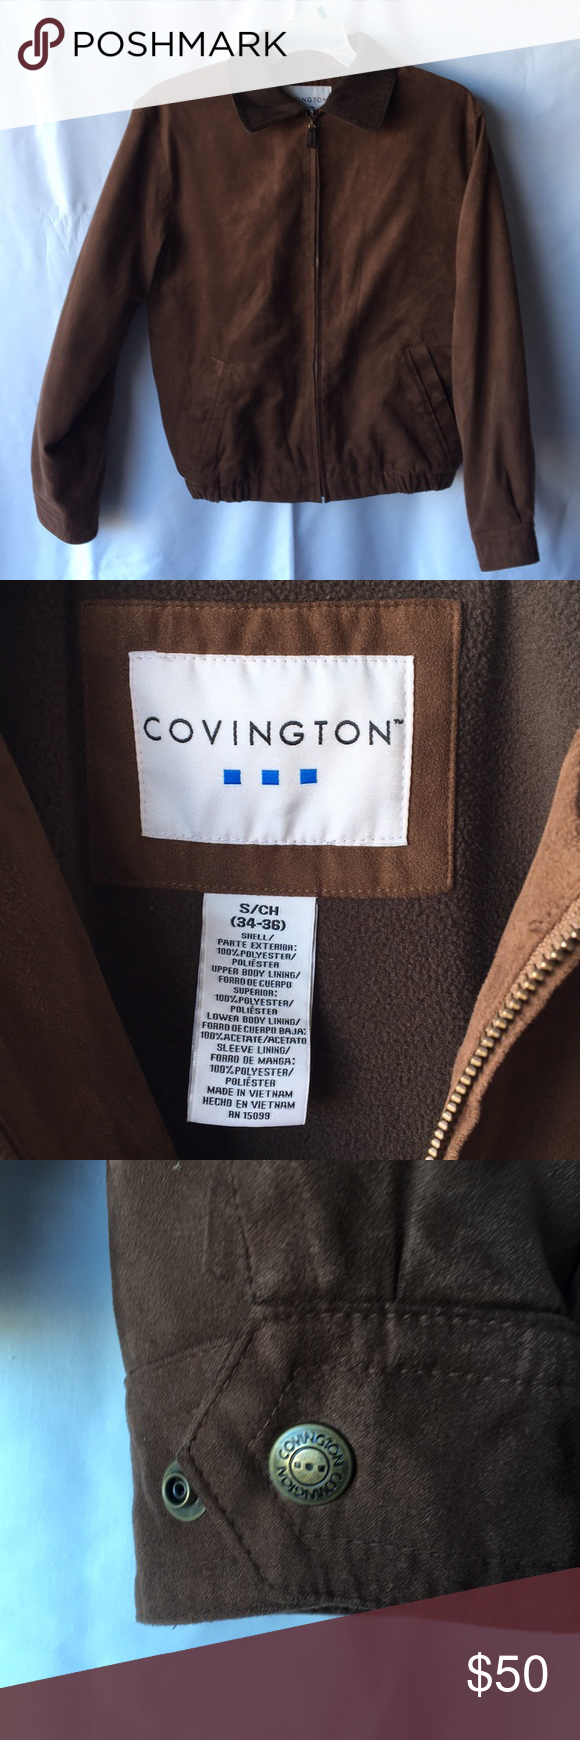 Covington Mens Suede Full Zip Winter Brown Jacket Condition In Good Conditions Measurement Body Size 22 Arm Le Winter Brown Jacket Brown Jacket Covington [ 1740 x 580 Pixel ]